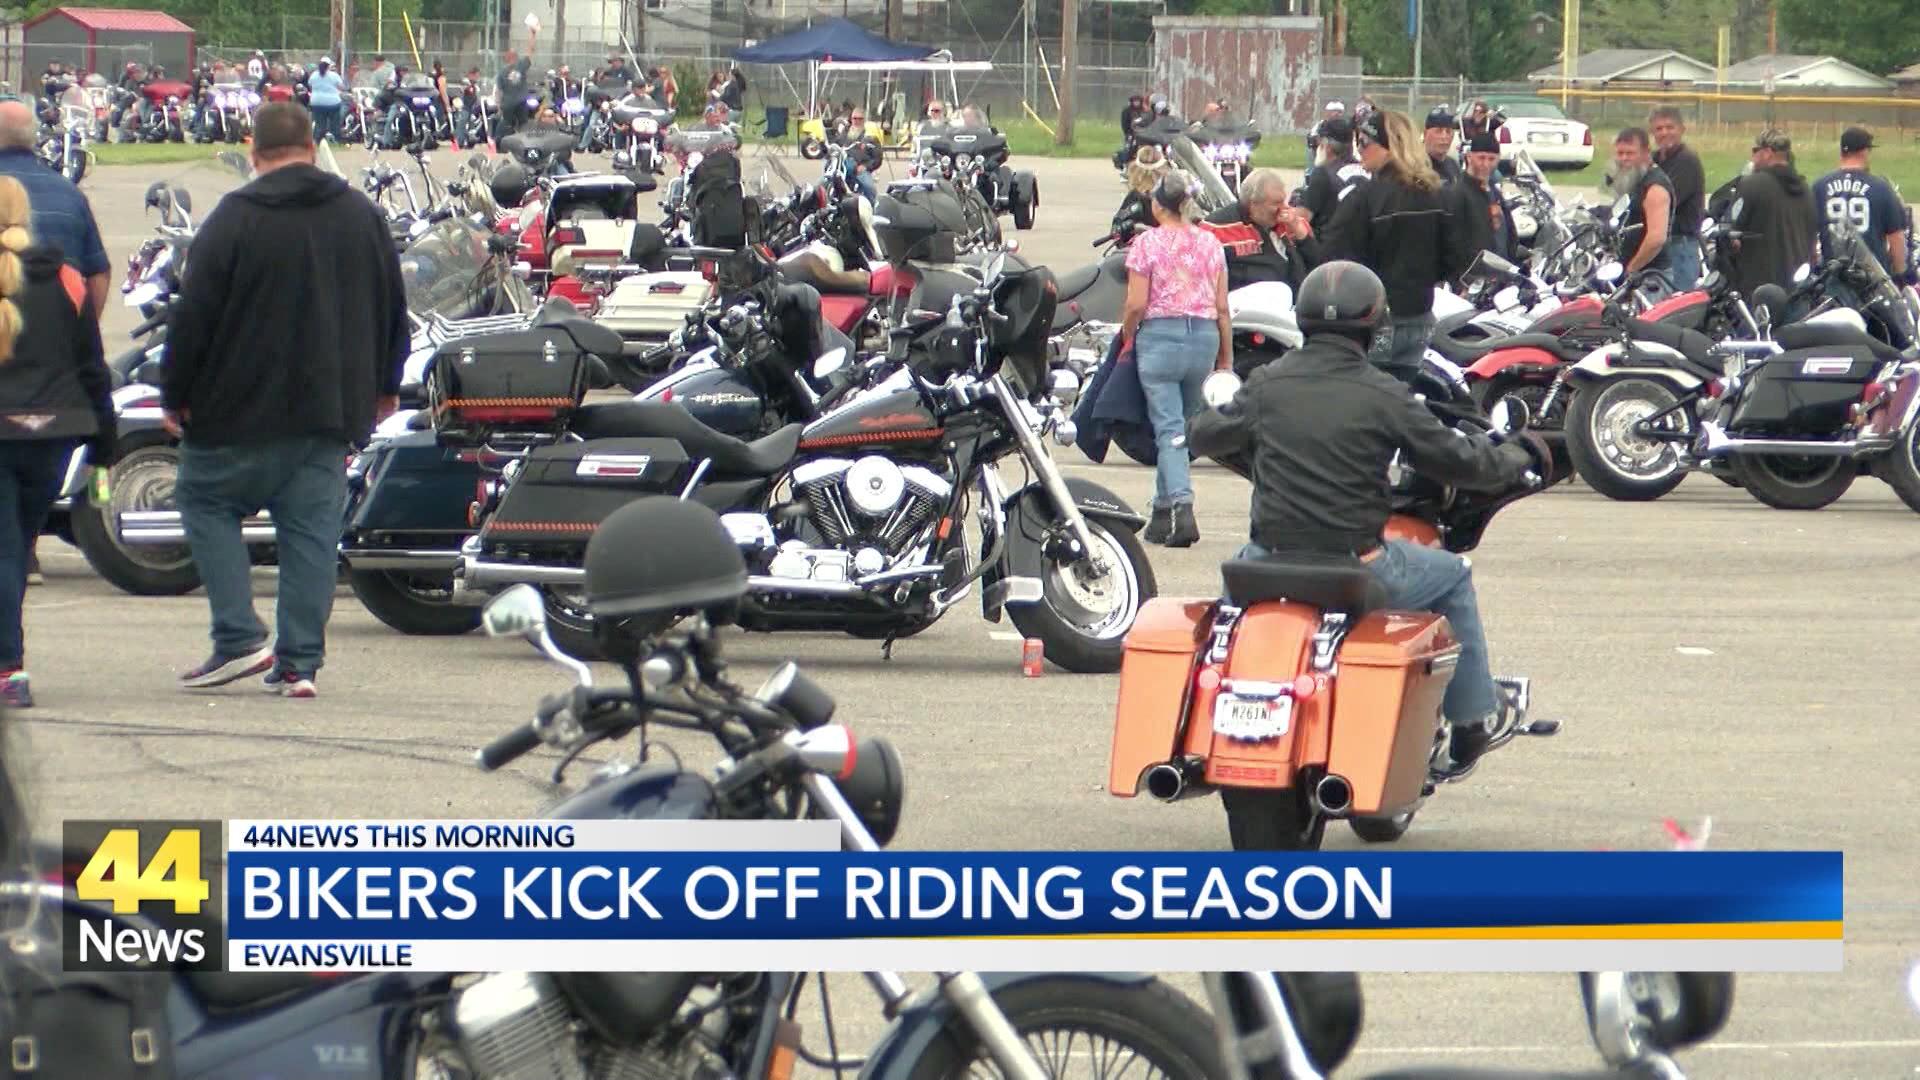 Image for Bikers Kick Off Riding Season